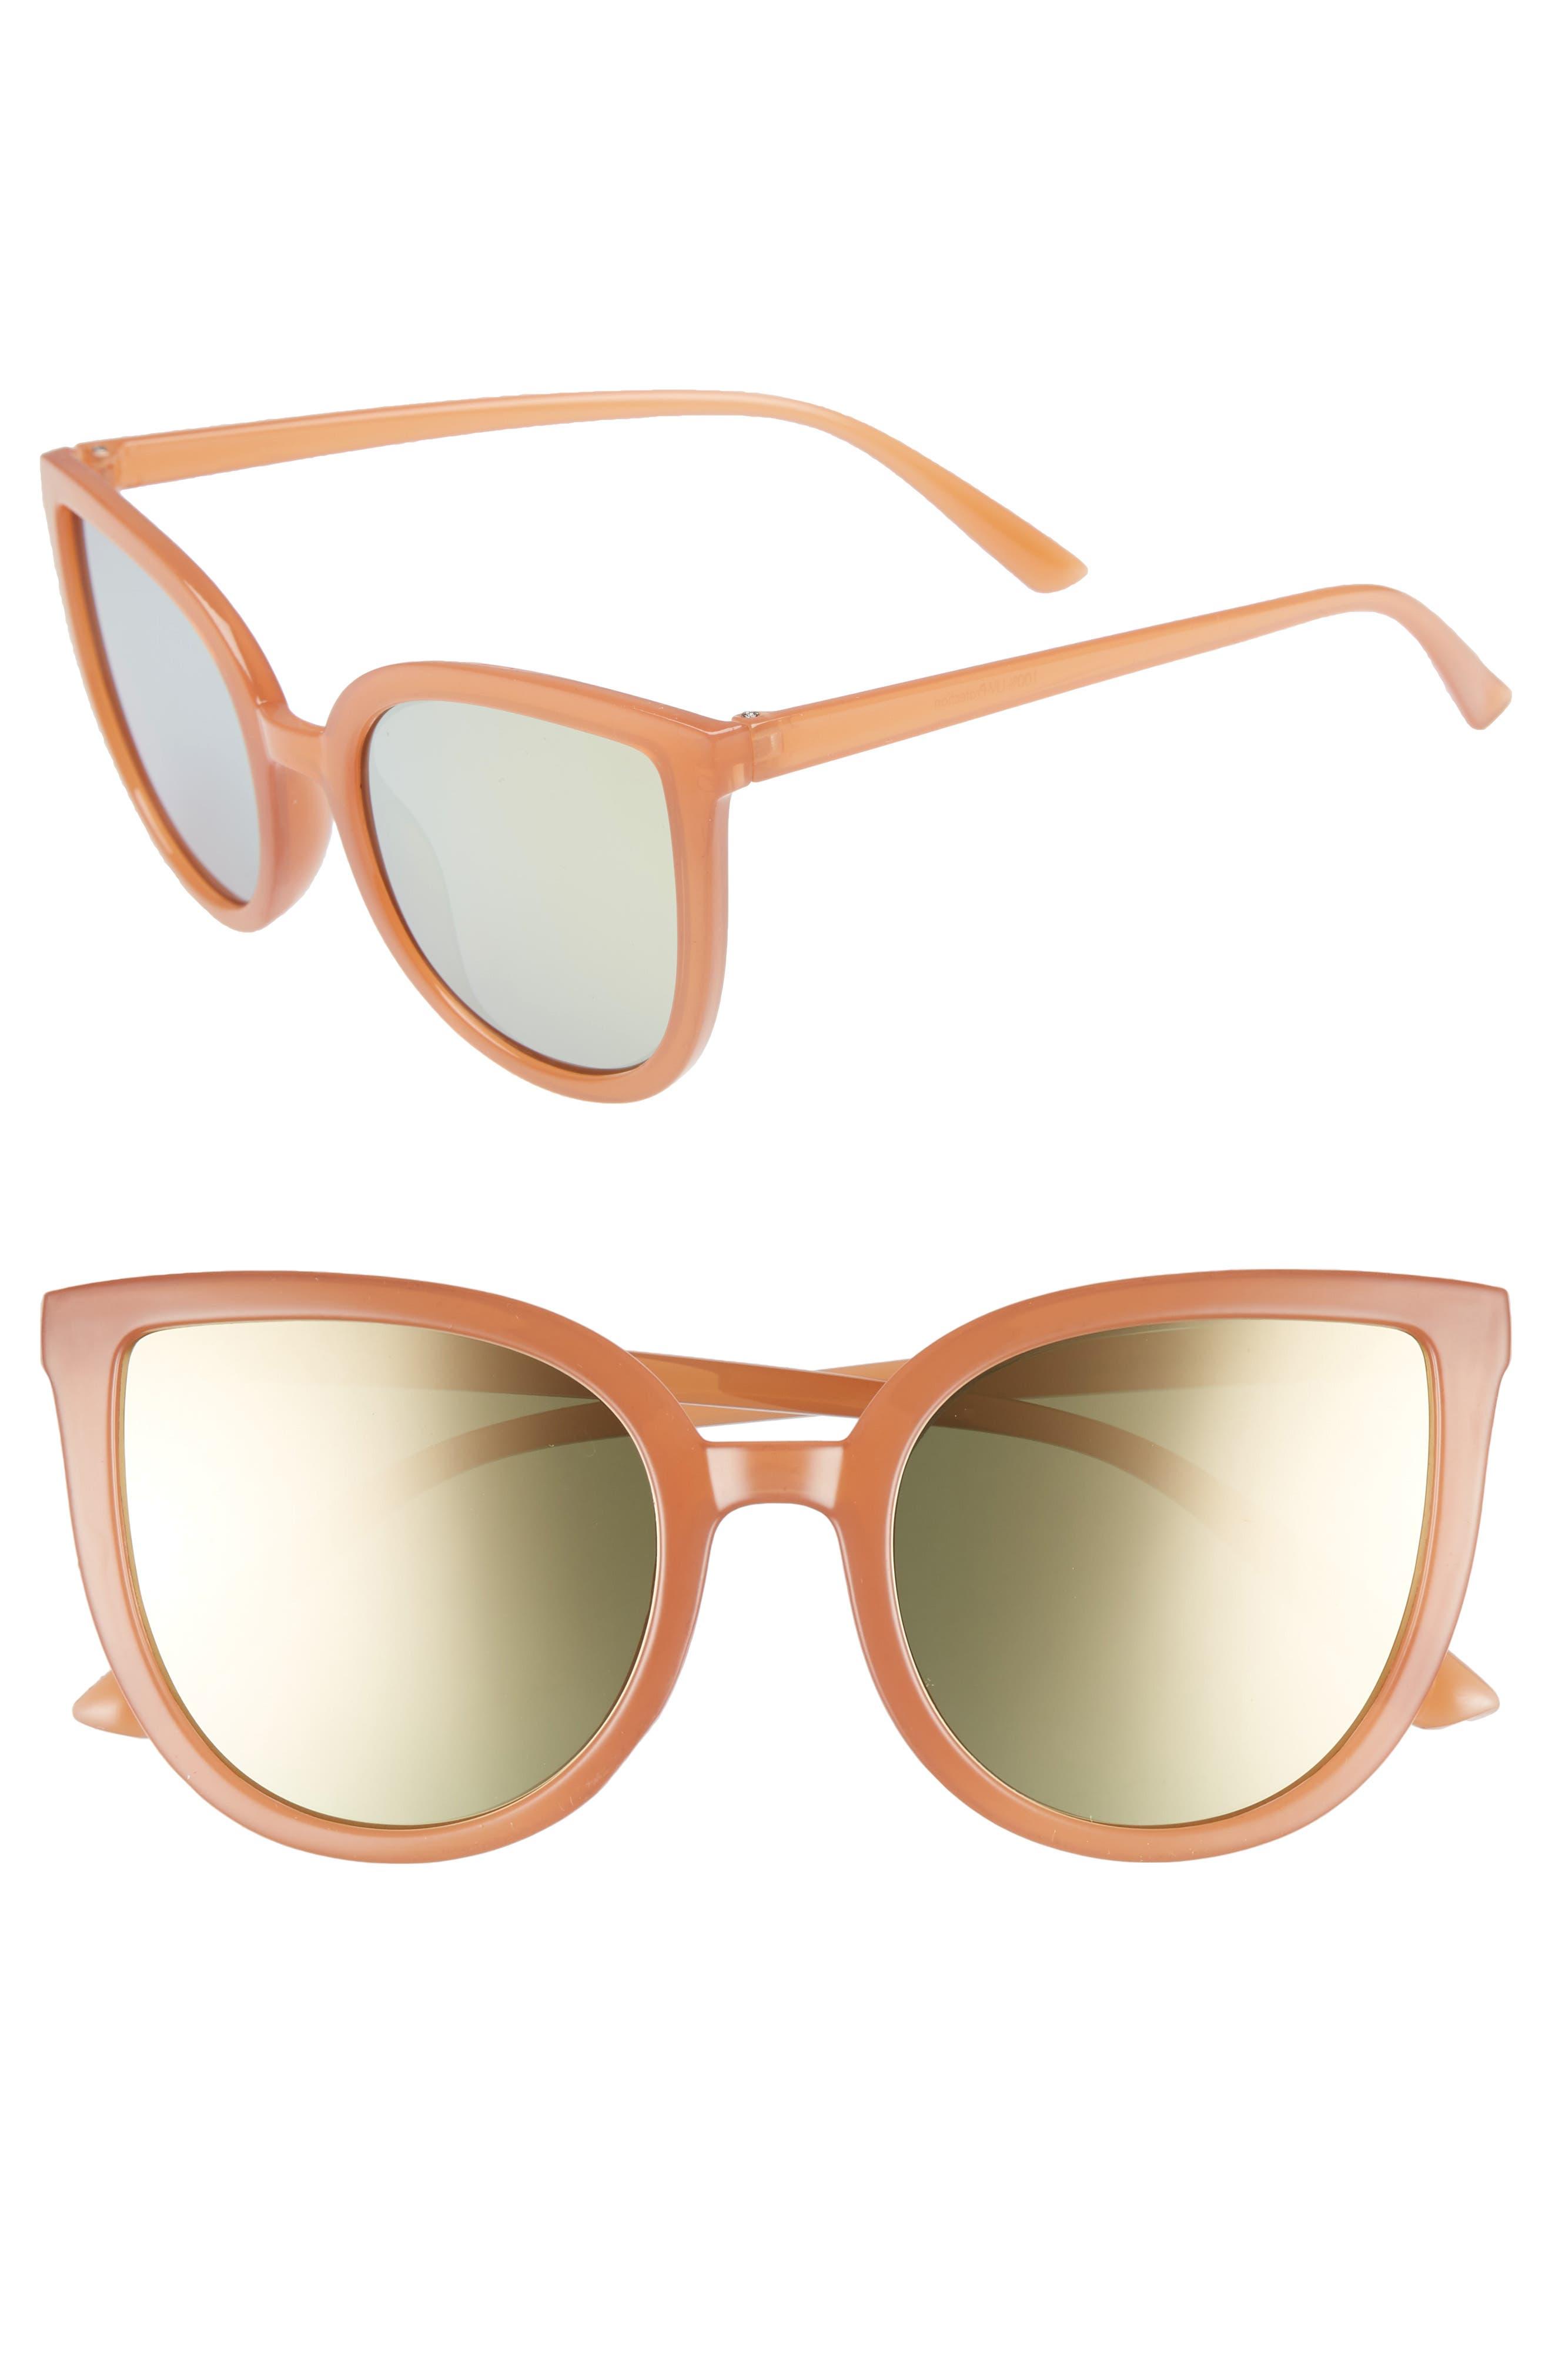 Thin Cat Eye Sunglasses,                             Main thumbnail 1, color,                             950